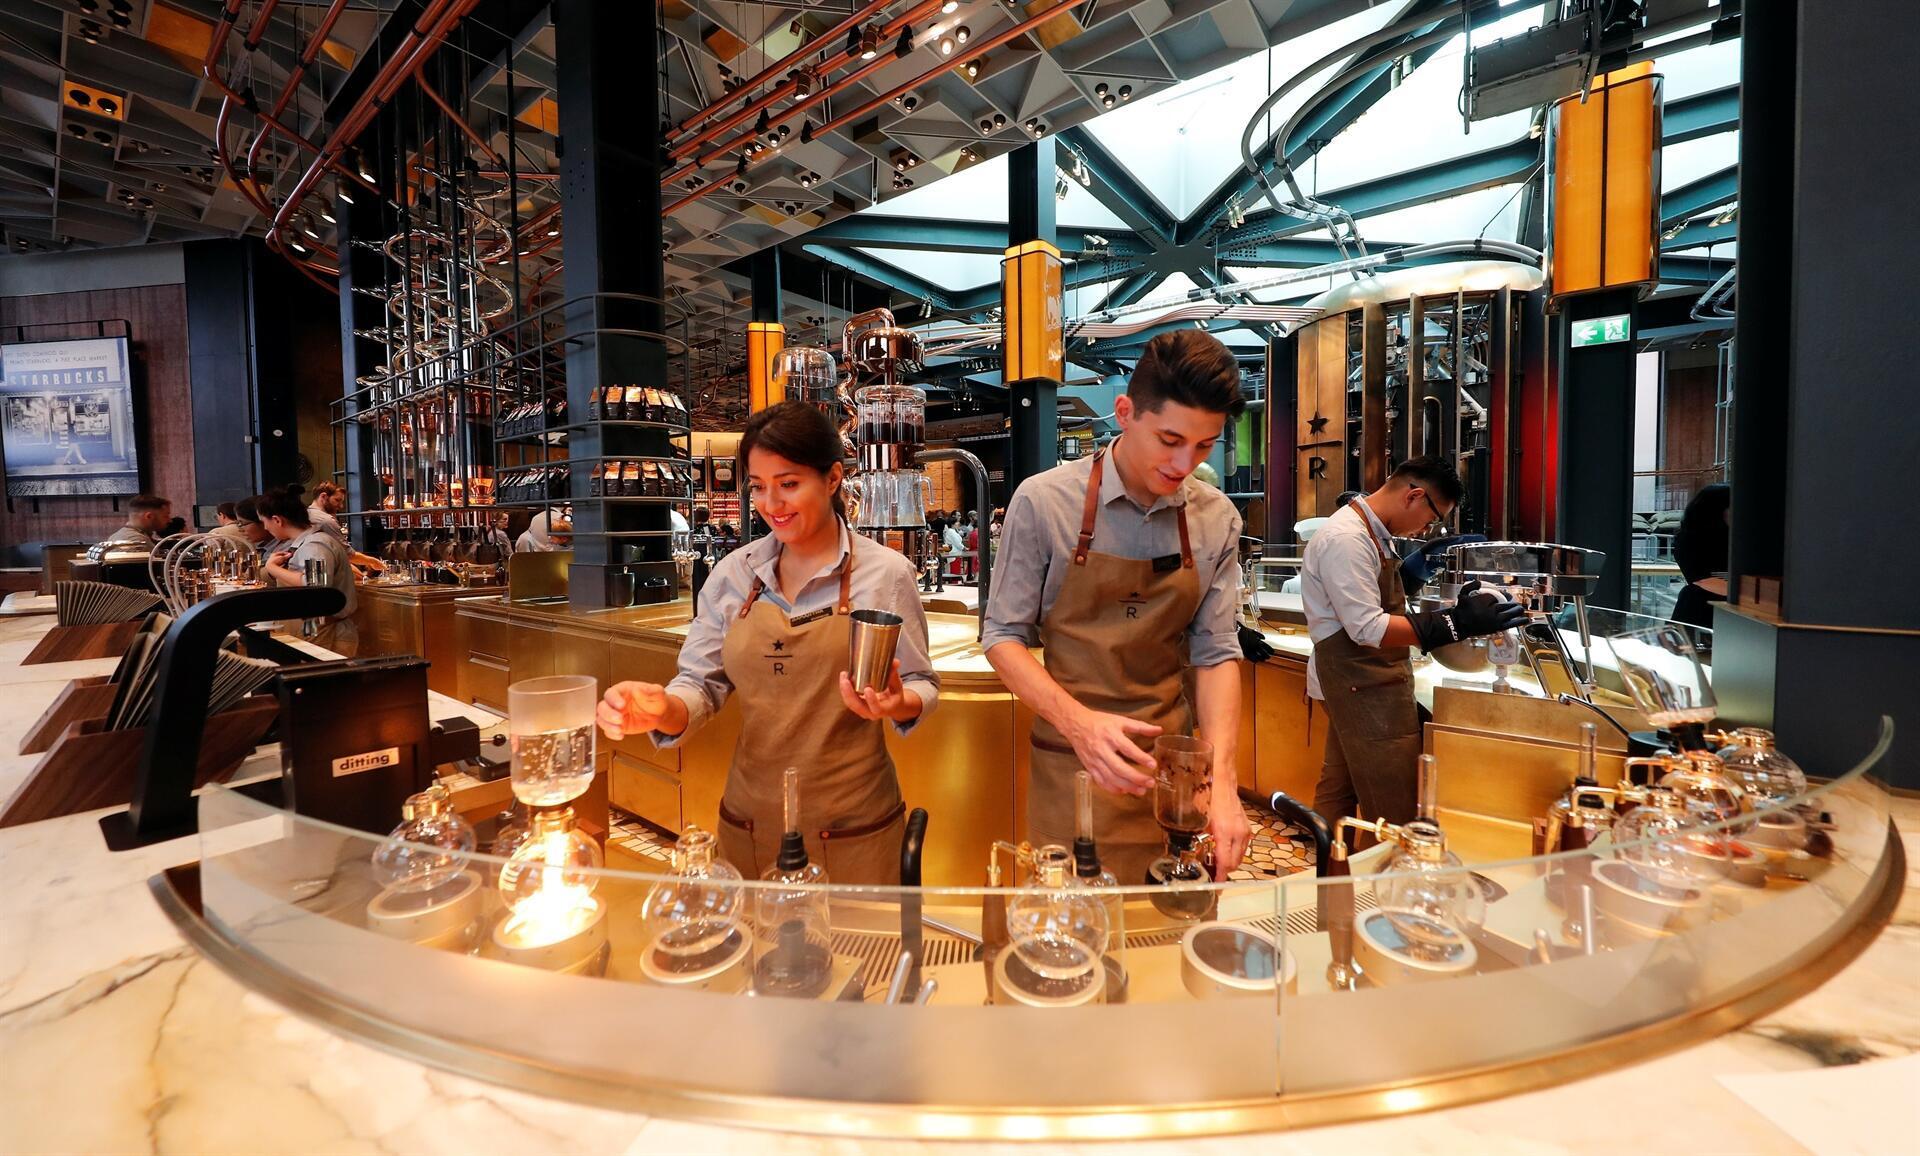 Starbucks finally opens cafe in italy home of espresso for Starbucks italie